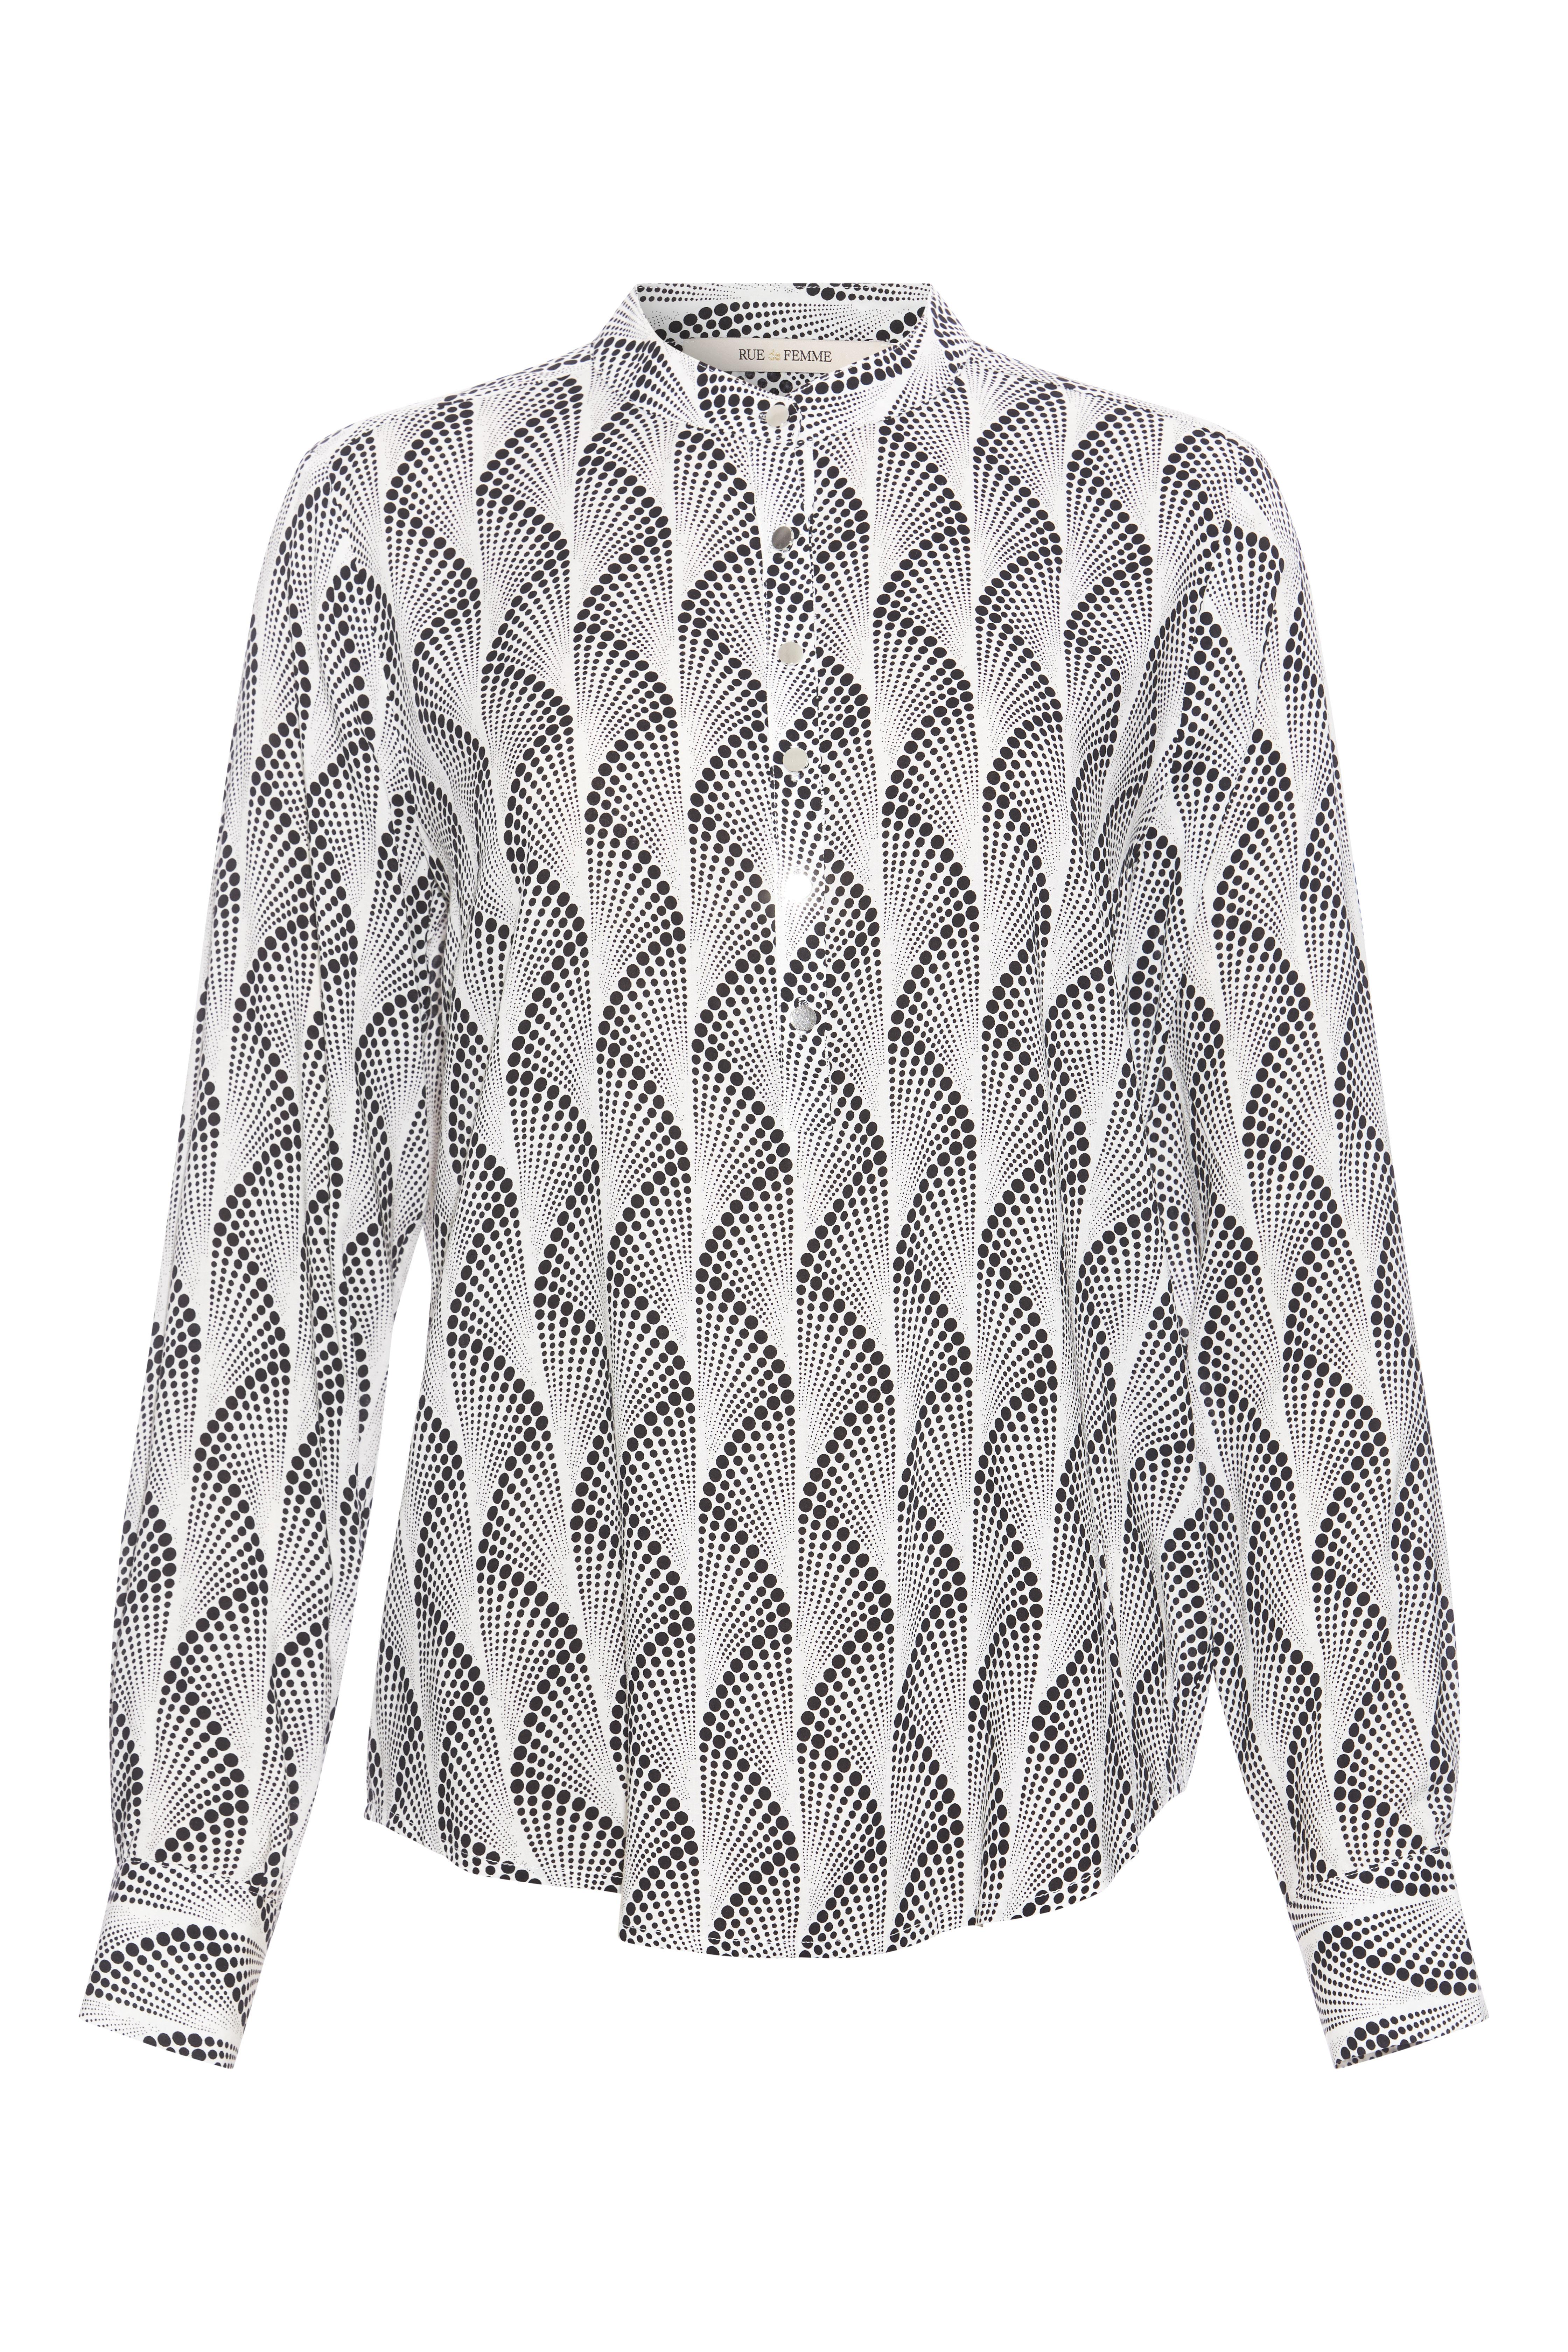 Rue de Femme Dot skjorte, black, x-small